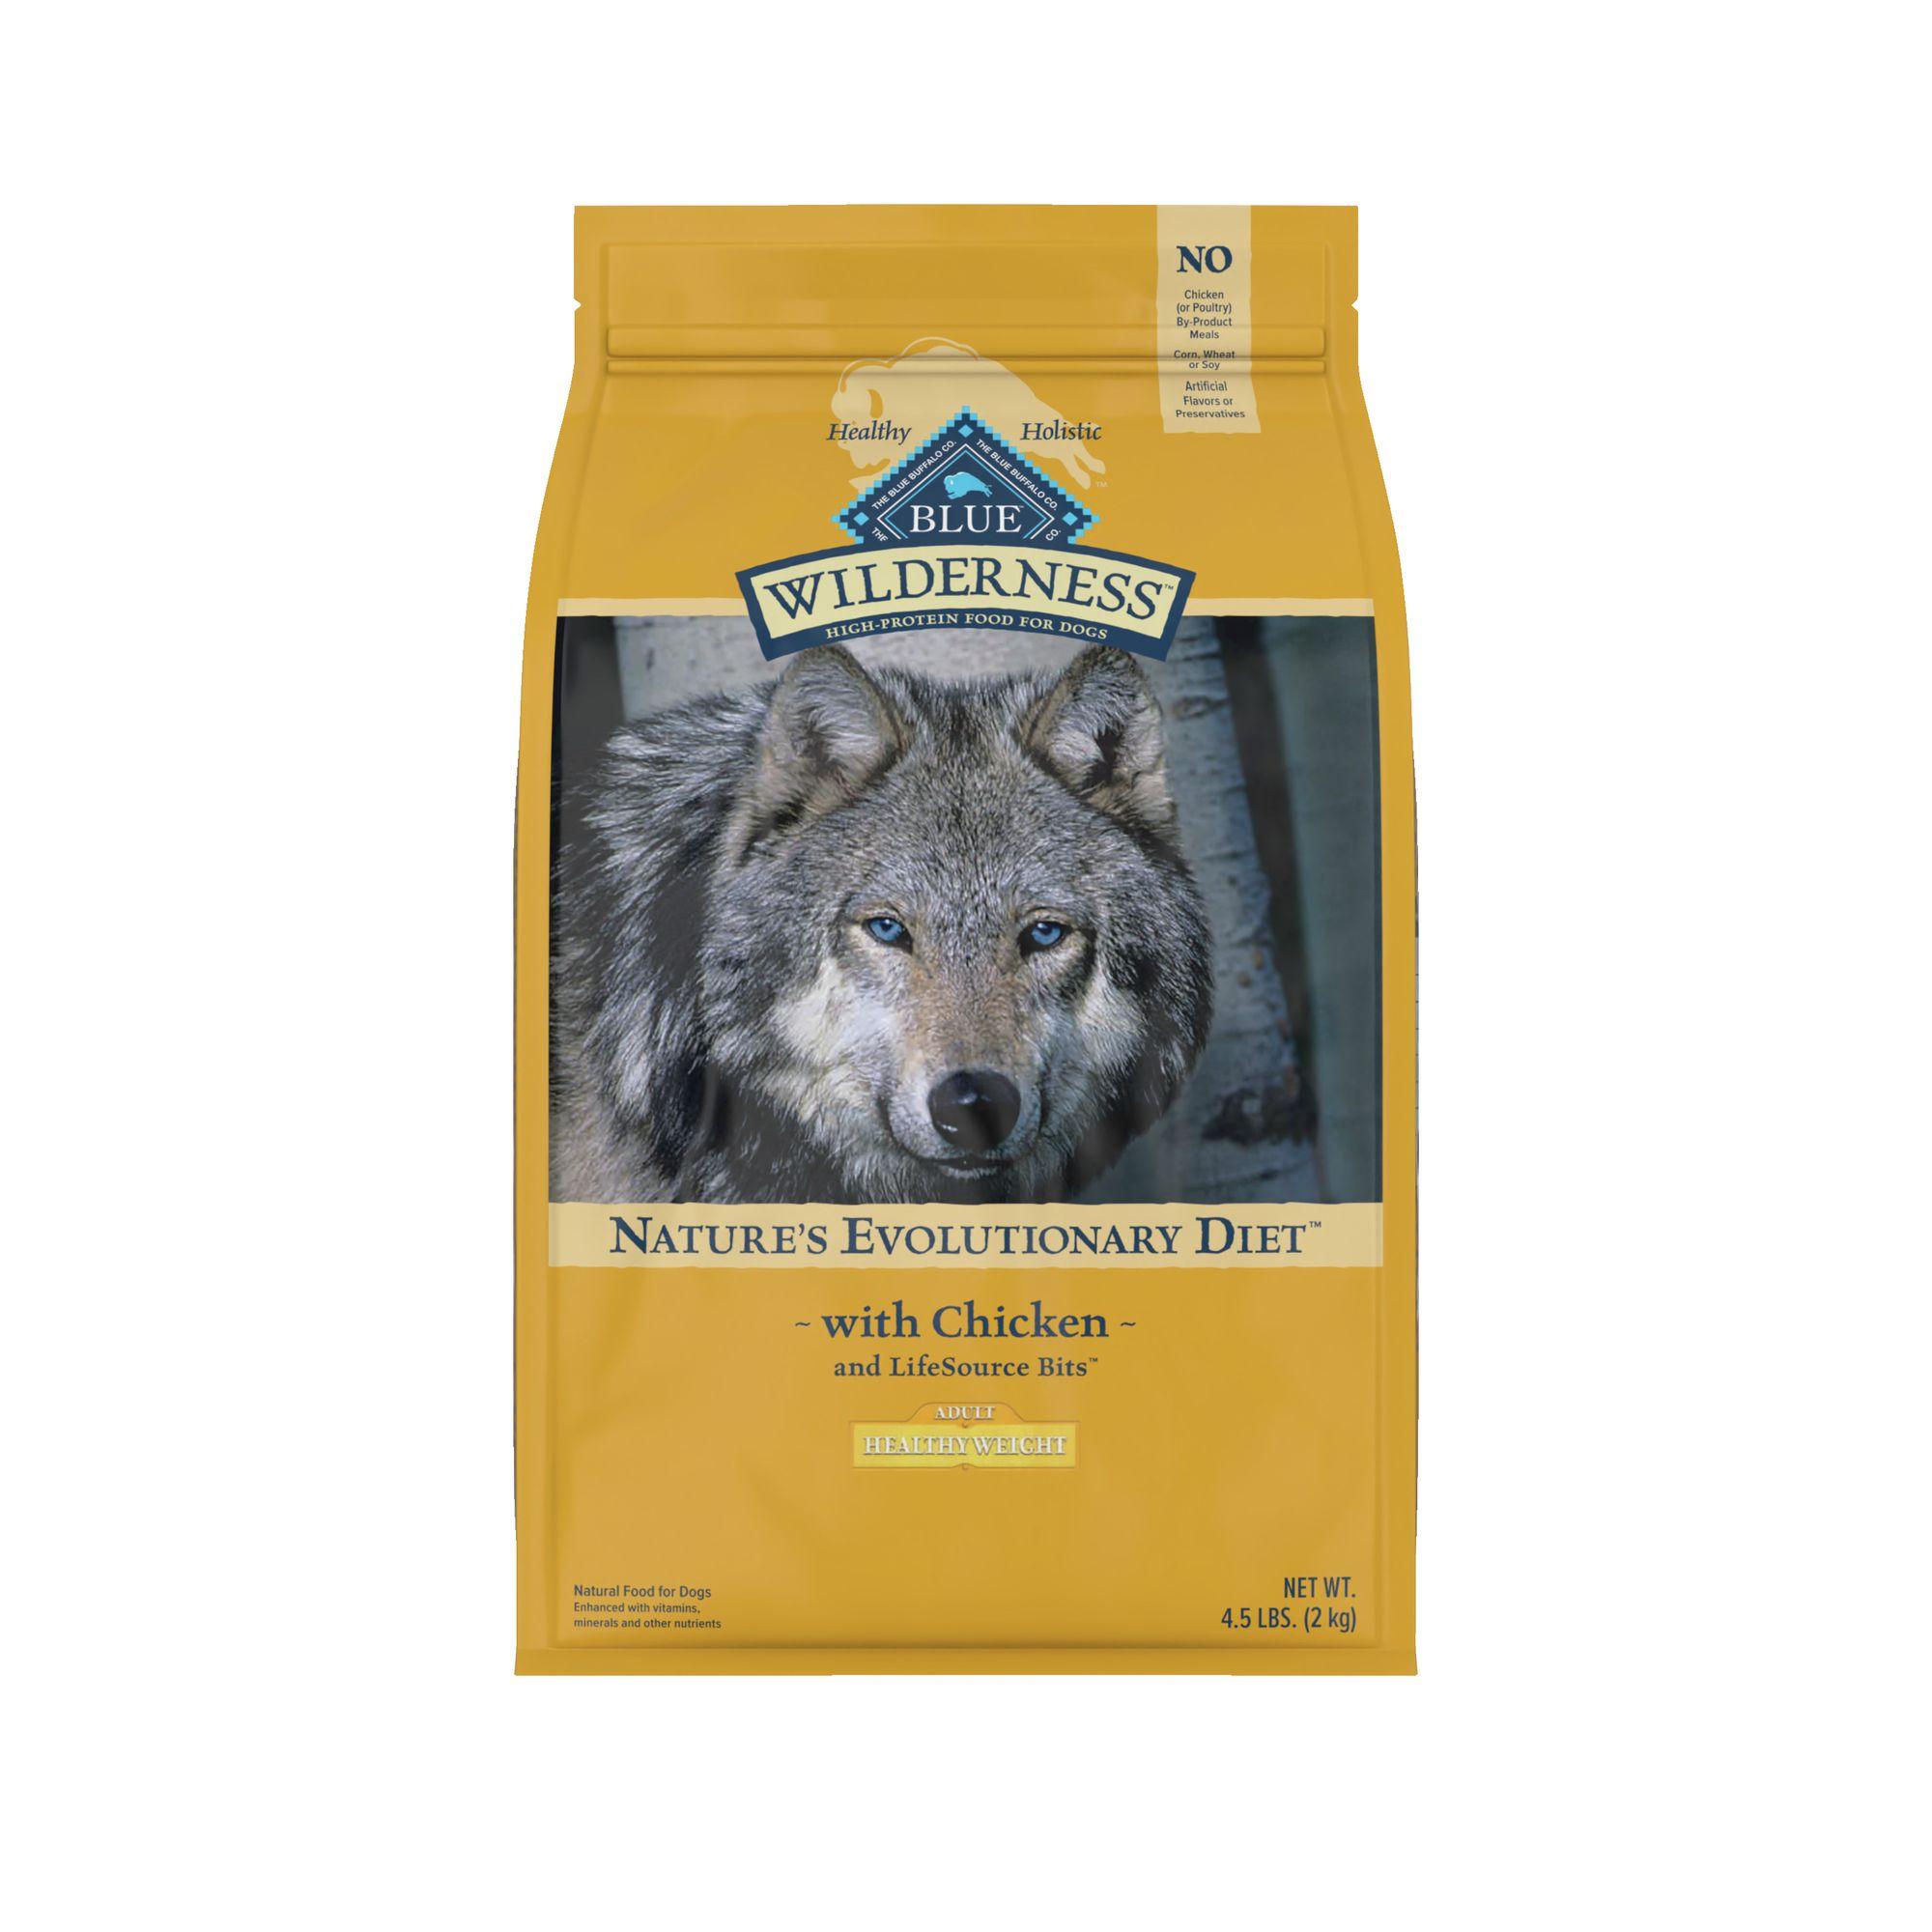 Petsmart blue buffalo dog food coupons